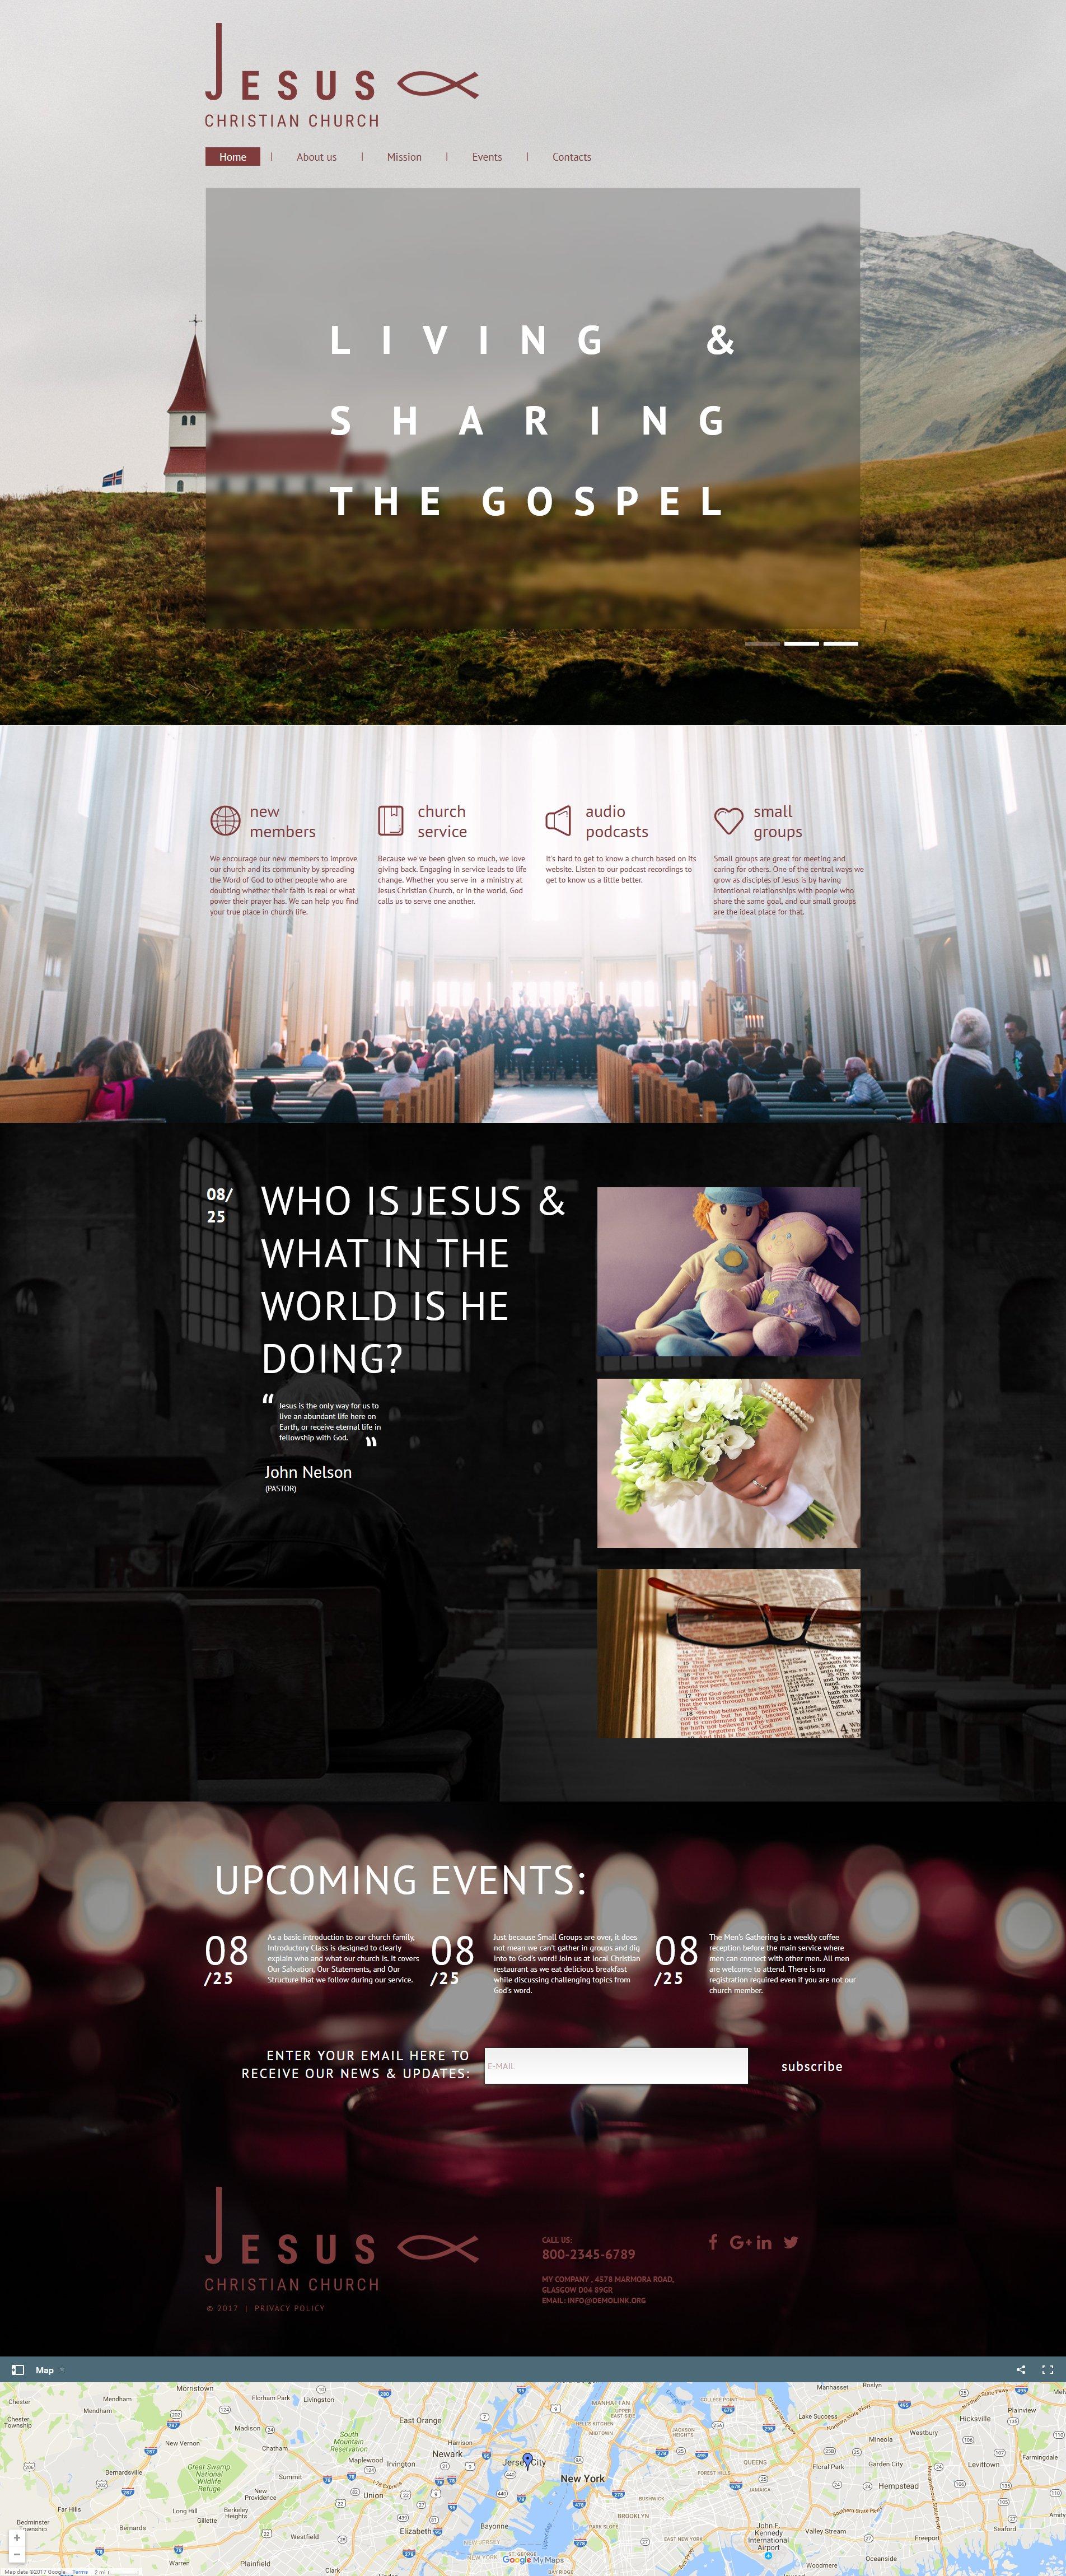 Szablon Moto CMS HTML Jesus - Christian Church #59306